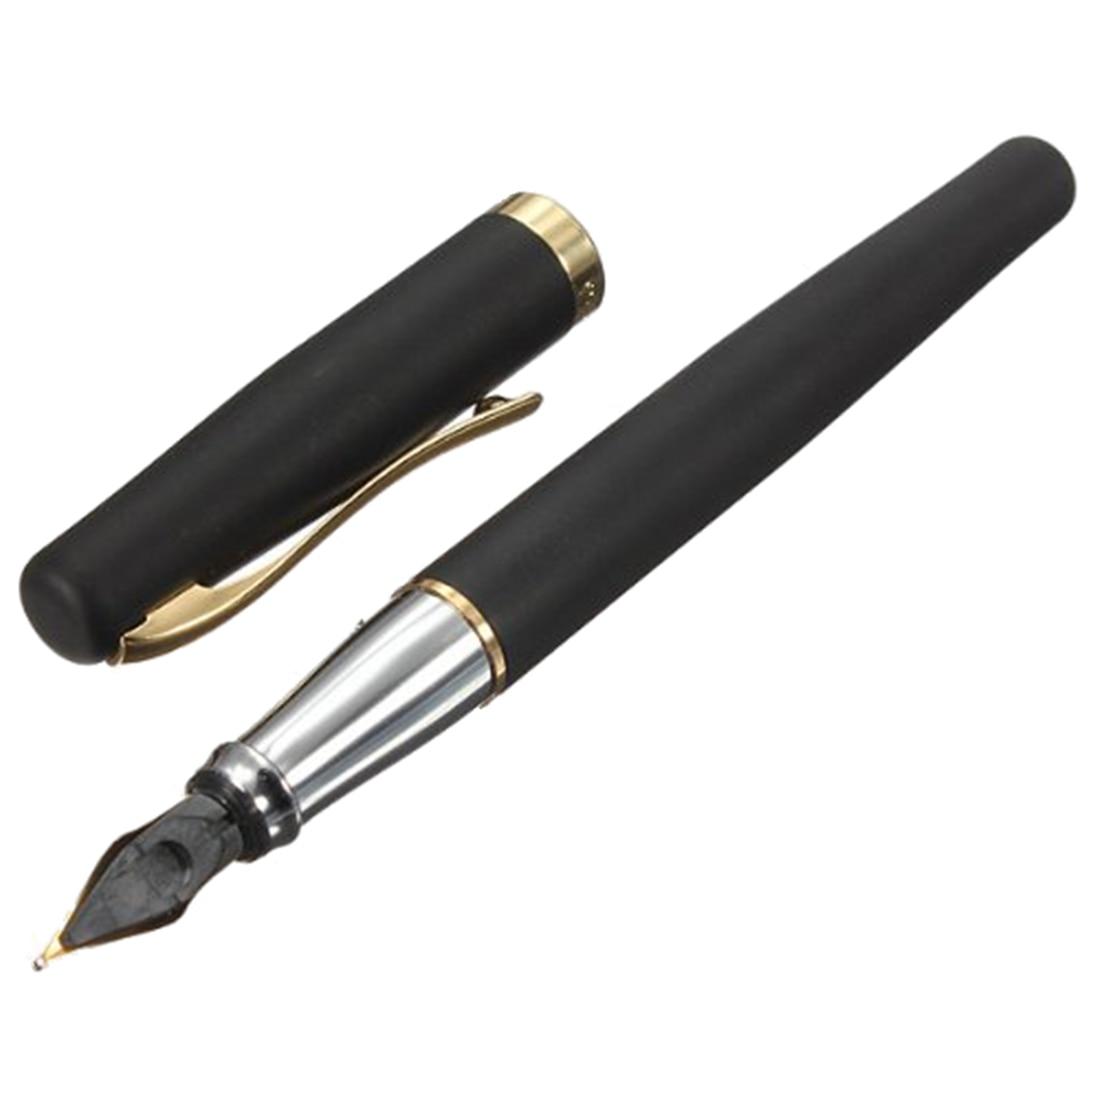 цена на Wholesale 10pcs of Duke Luxury Fountain Pen Fountain Pen Kuli Golden M Nib Gift